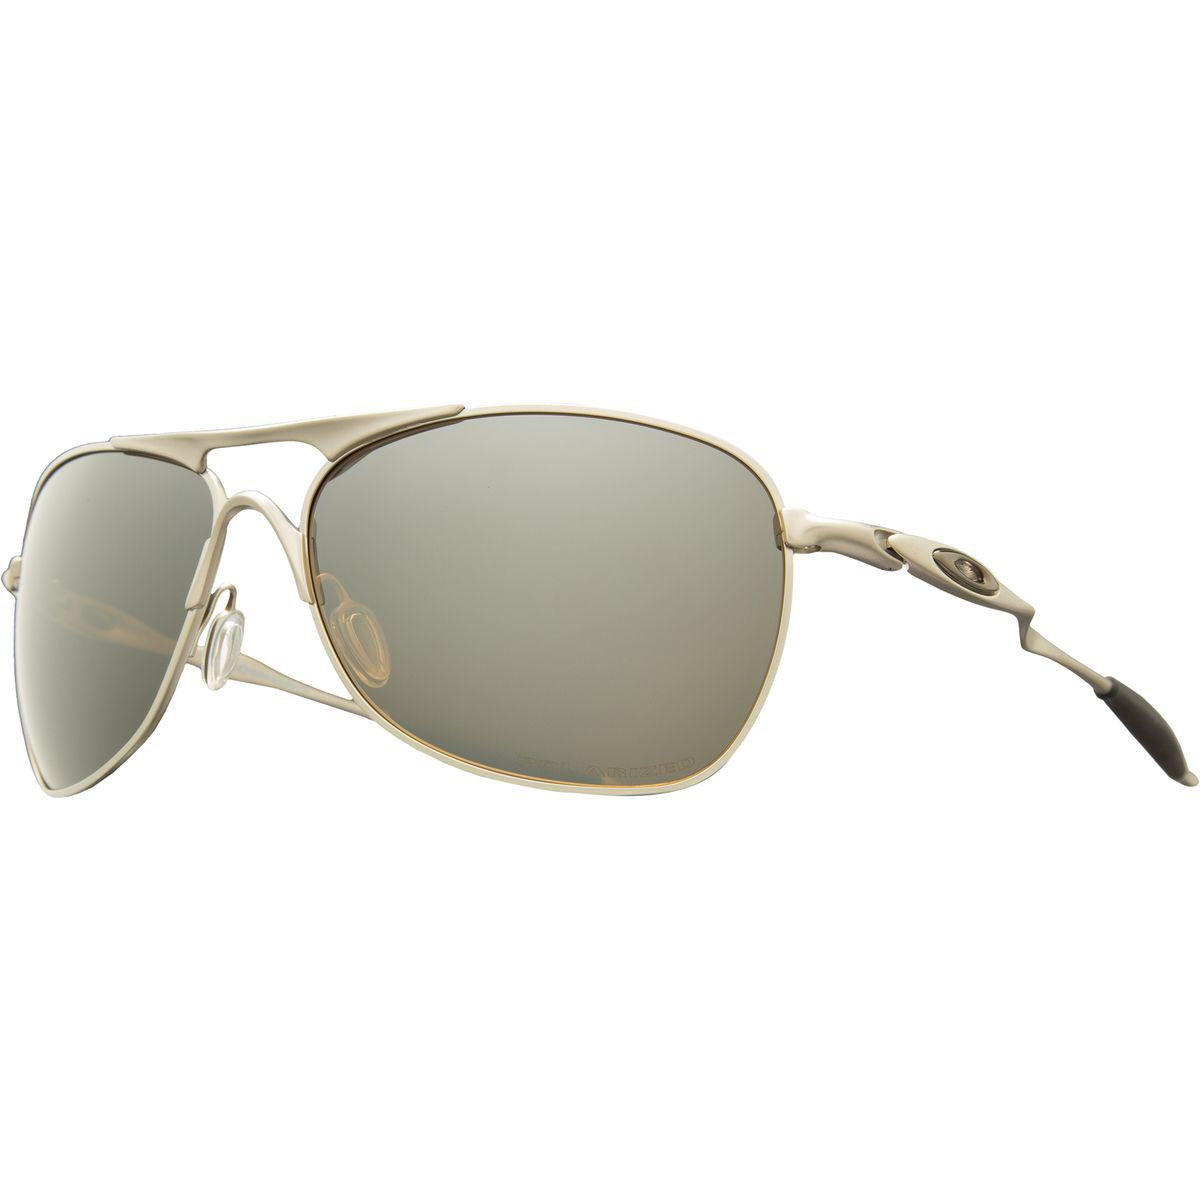 f9e2291628 Lyst - Oakley Titanium Crosshair Sunglasses - Polarized in Gray for Men